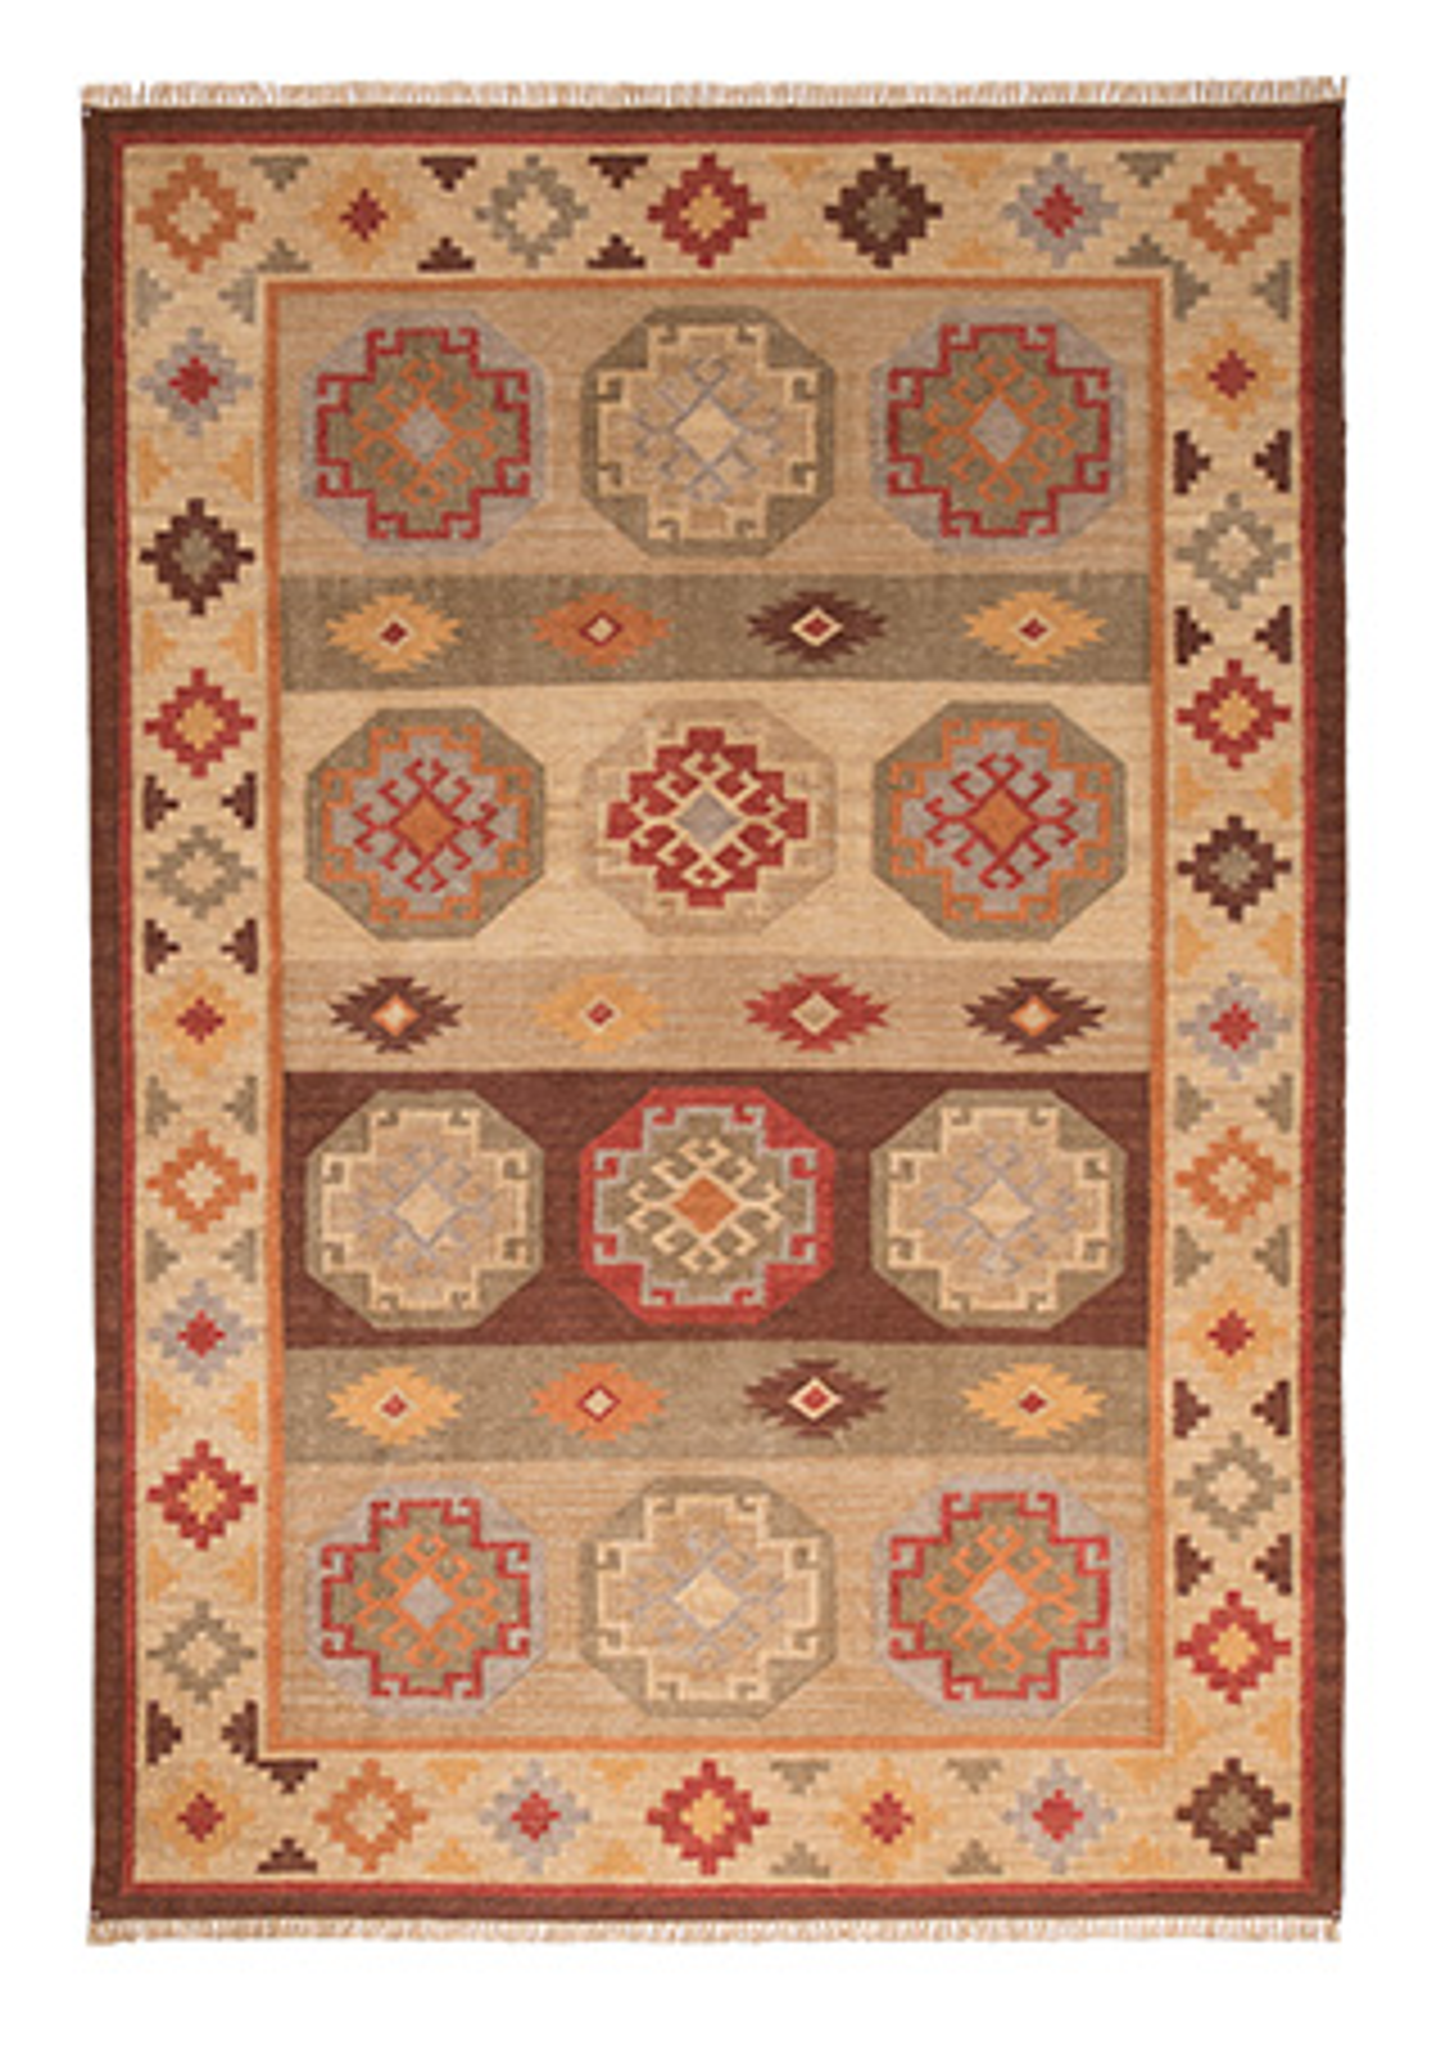 Kohra Indian Kilim Rug 180 X 270cm Gt Pure Wool Amp Cotton